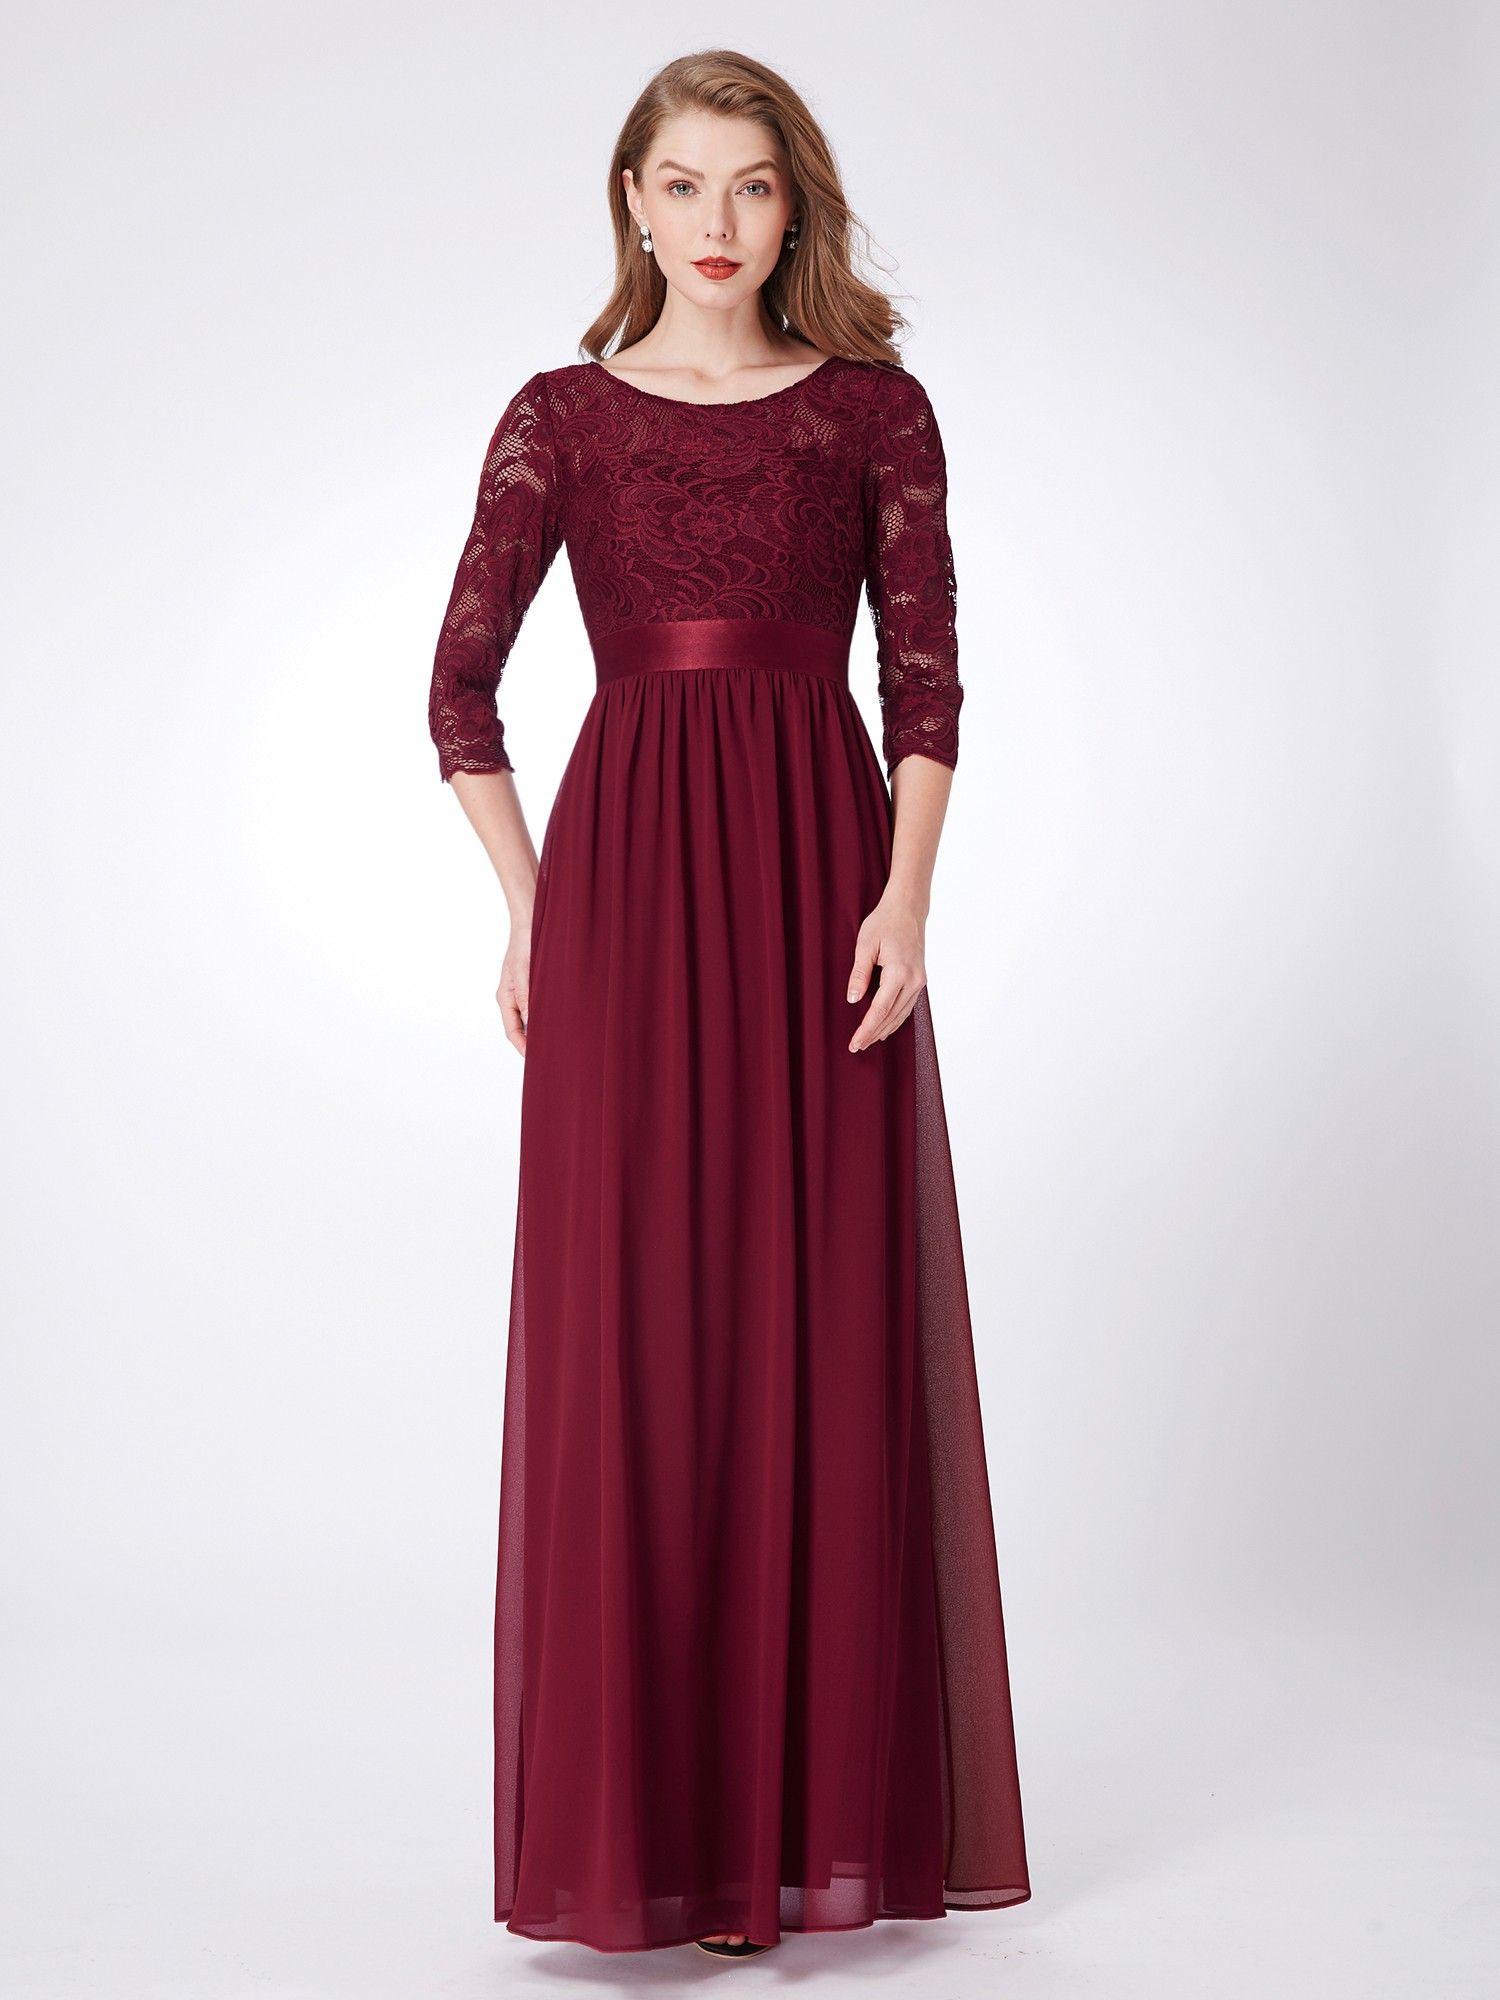 Lace long sleeve floor length dress band formal pinterest